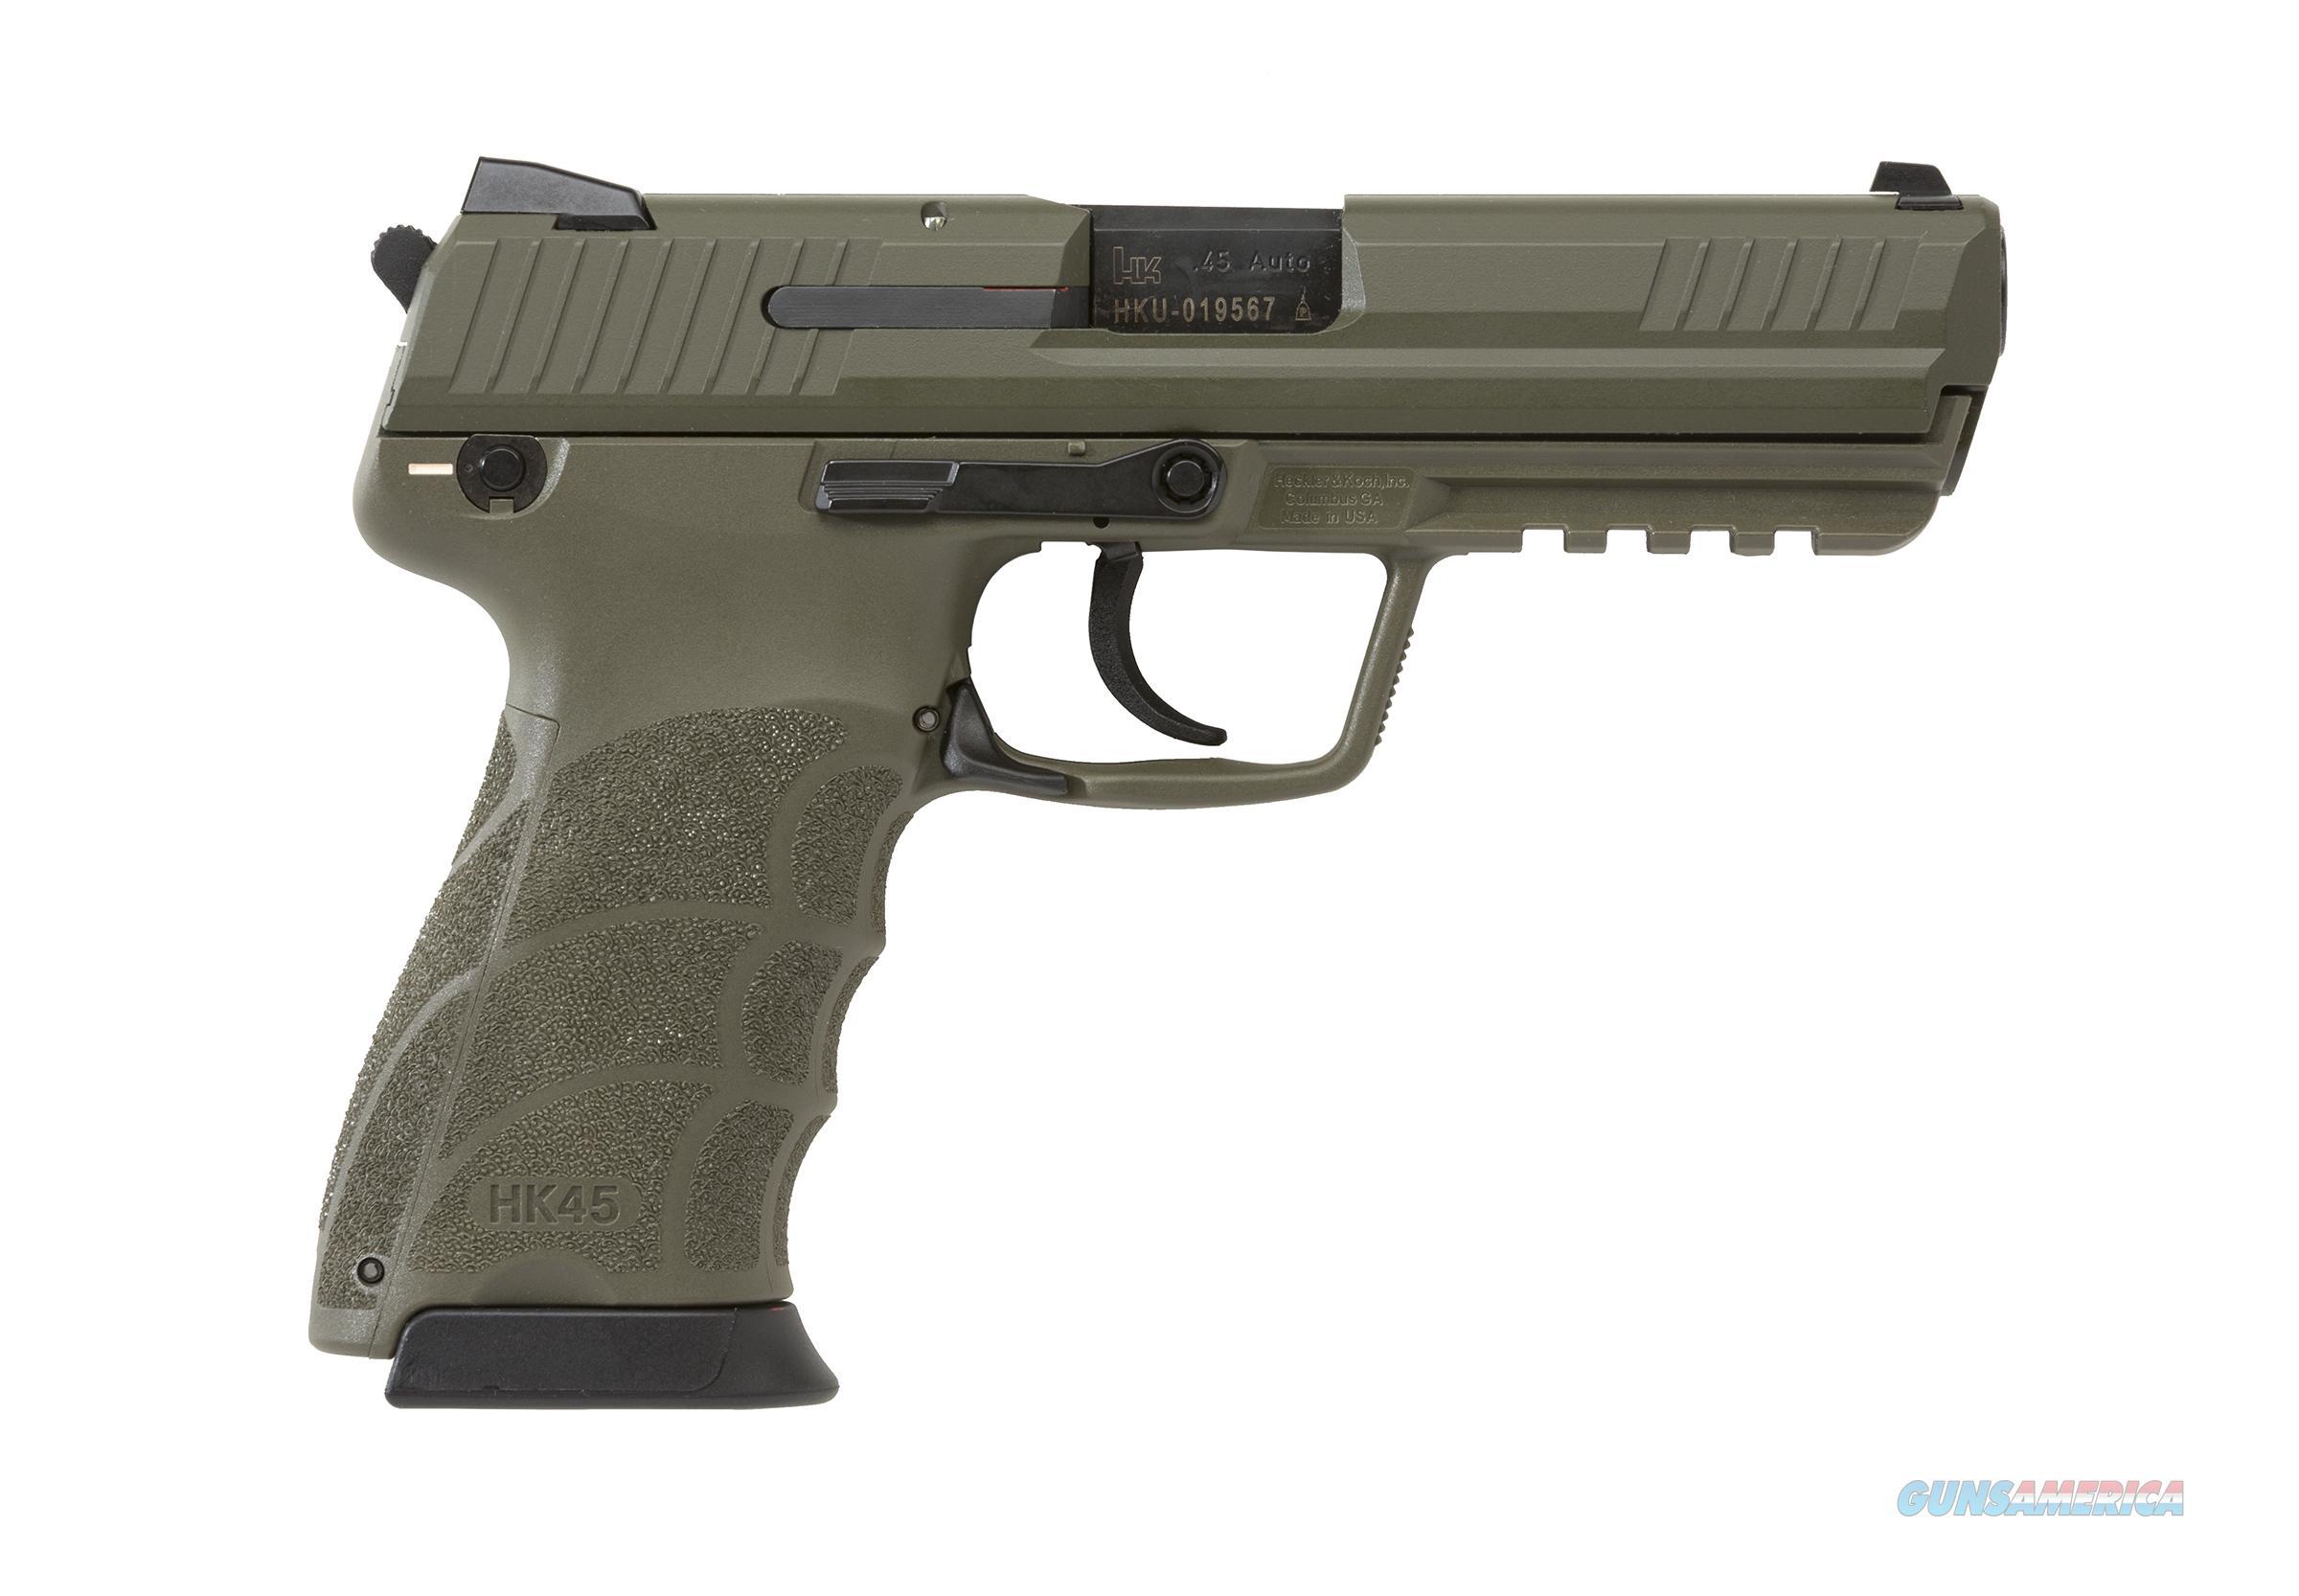 HECKLER & KOCH HK45-V1 .45ACP OD GREEN for sale